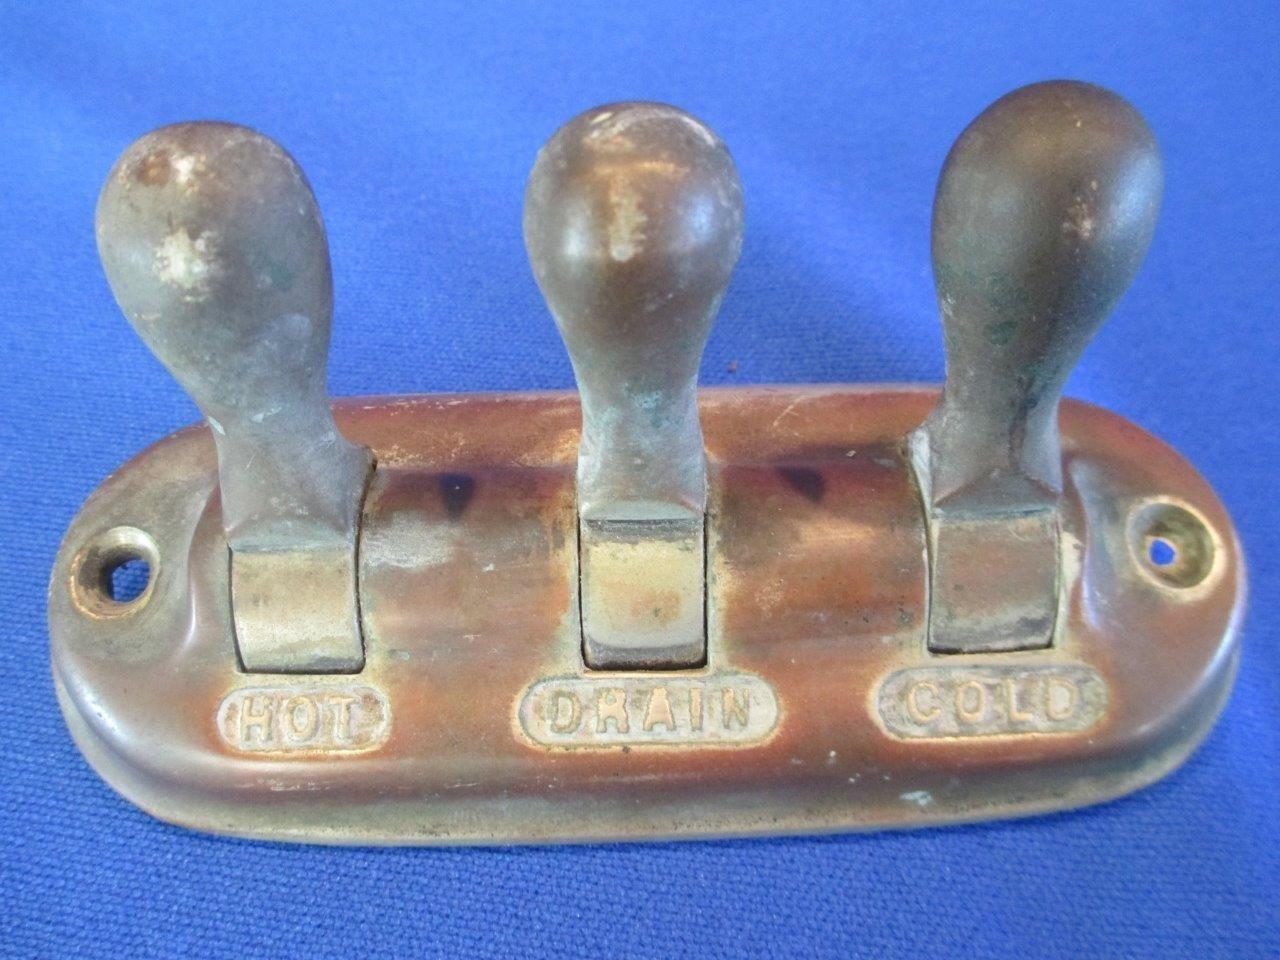 Antique Railroad Pullman Car Nickel Over Brass Vanity Sink Faucet Valve RARE | eBay